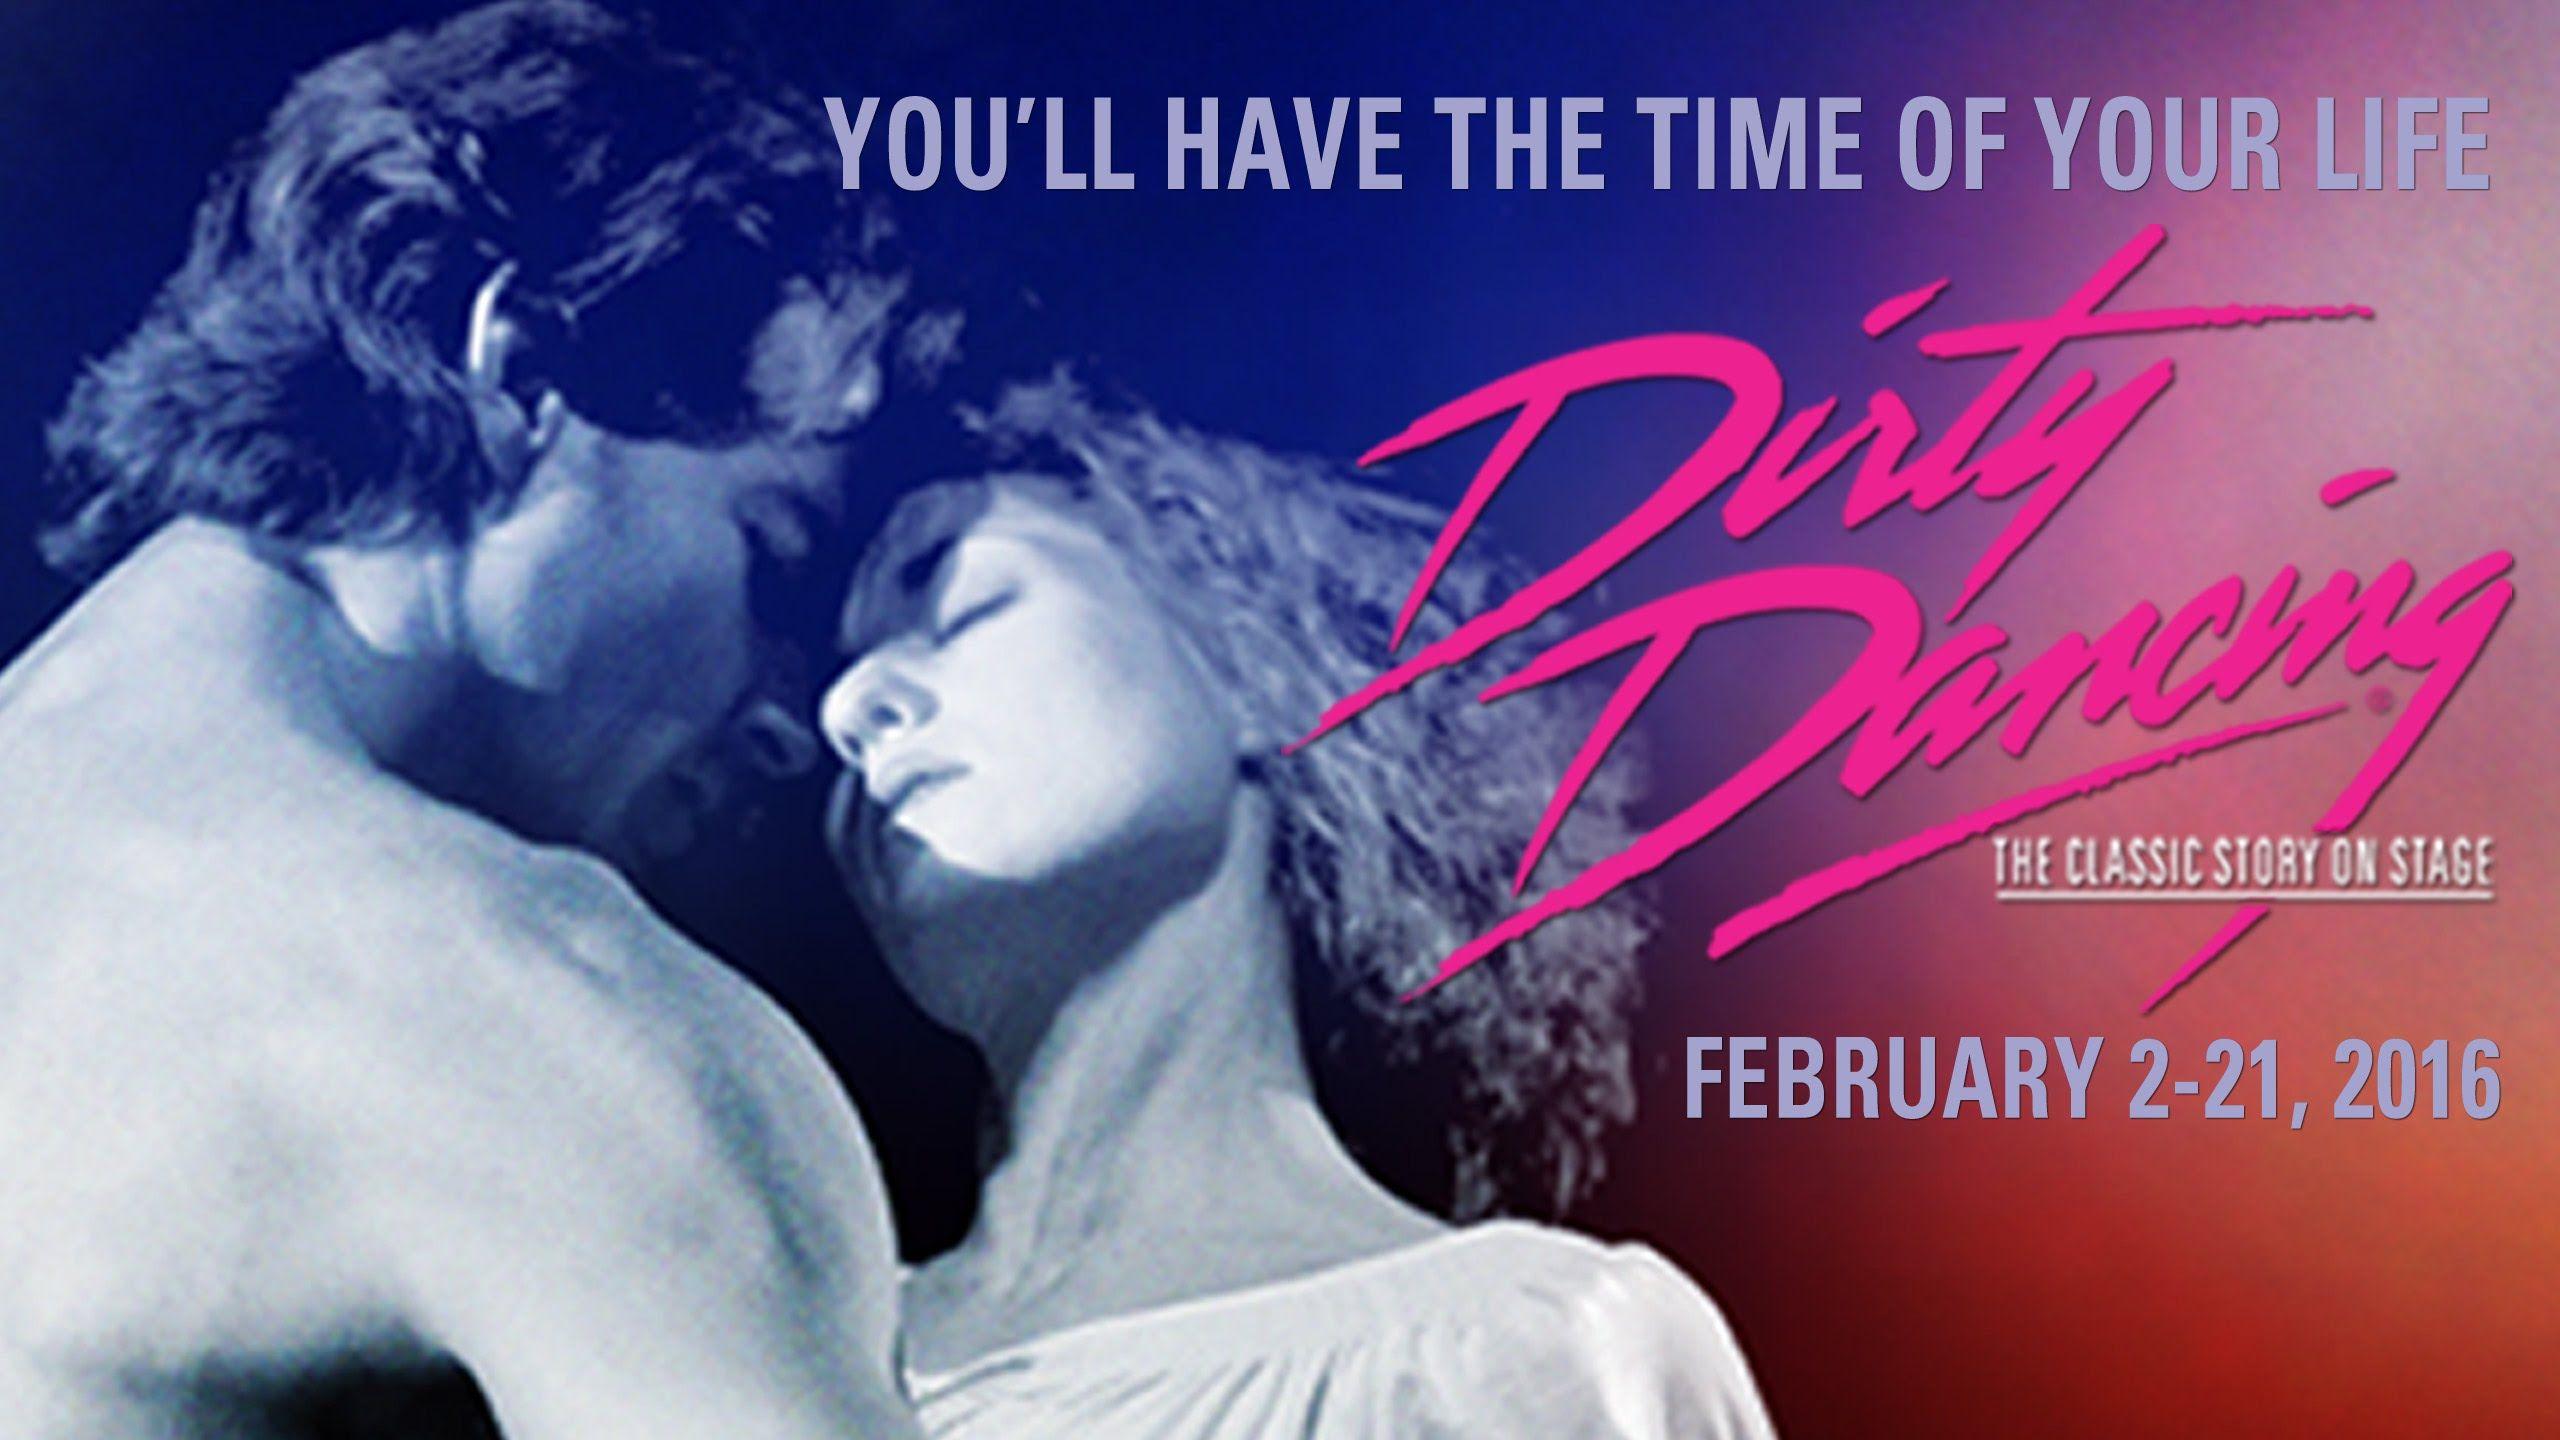 DIRTY DANCING -- February 2 - February 21, 2016 | Dirty Dancing ...